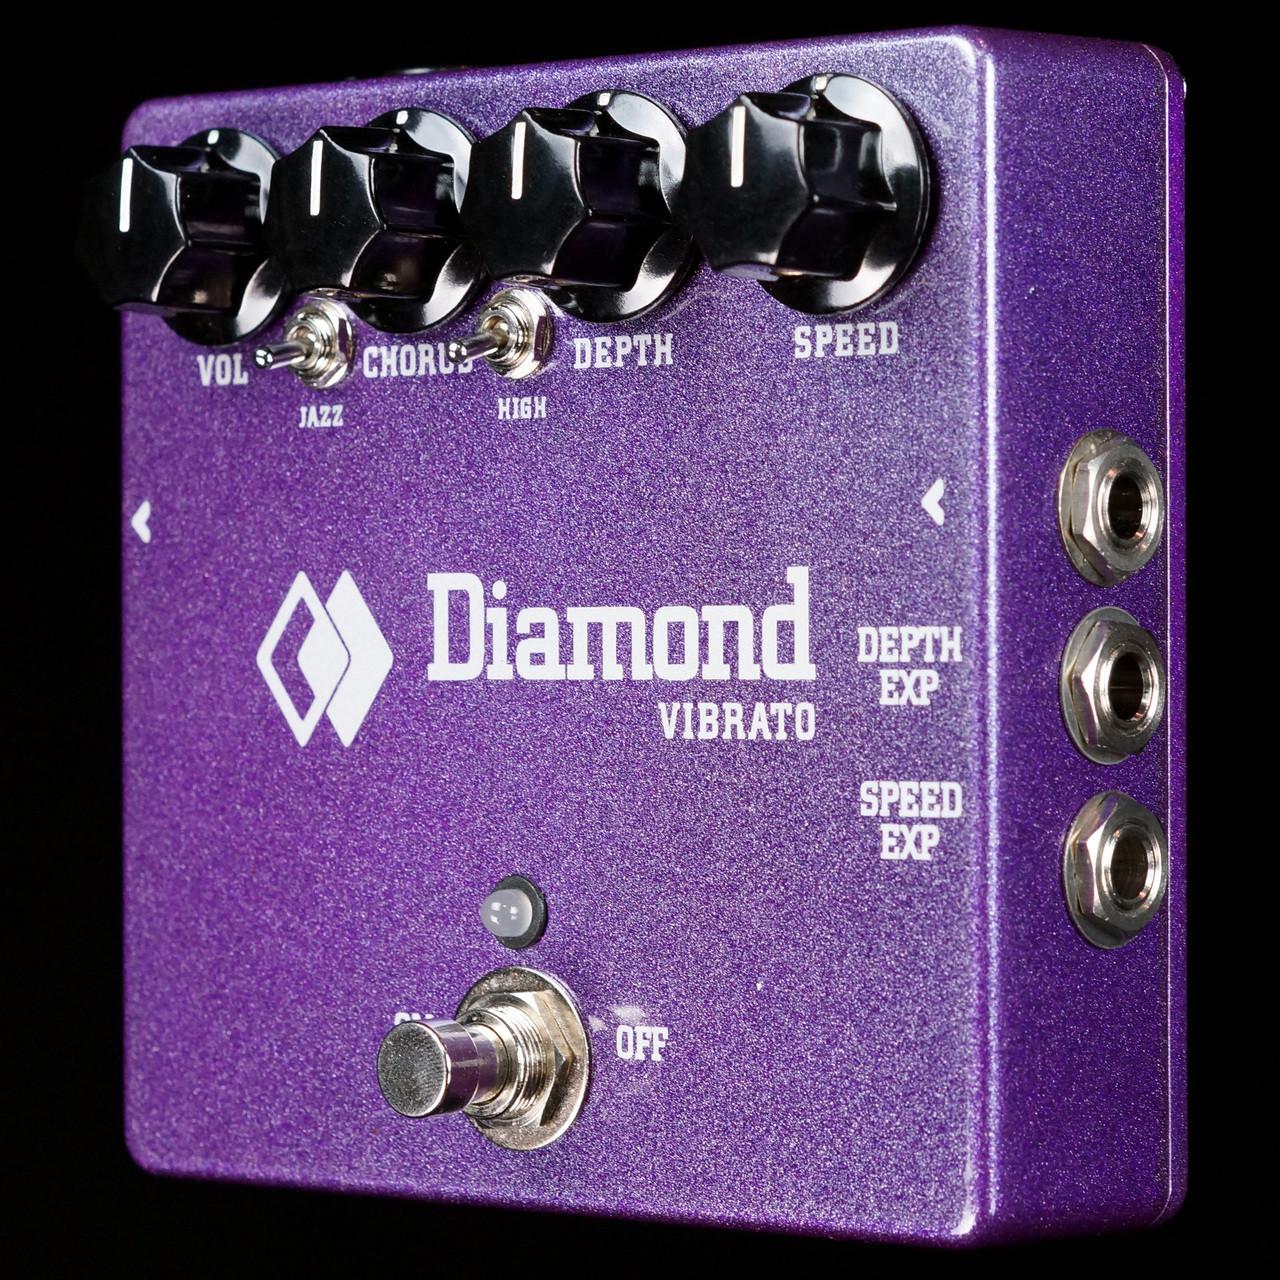 Diamond Analog Vibrato VIB1 3